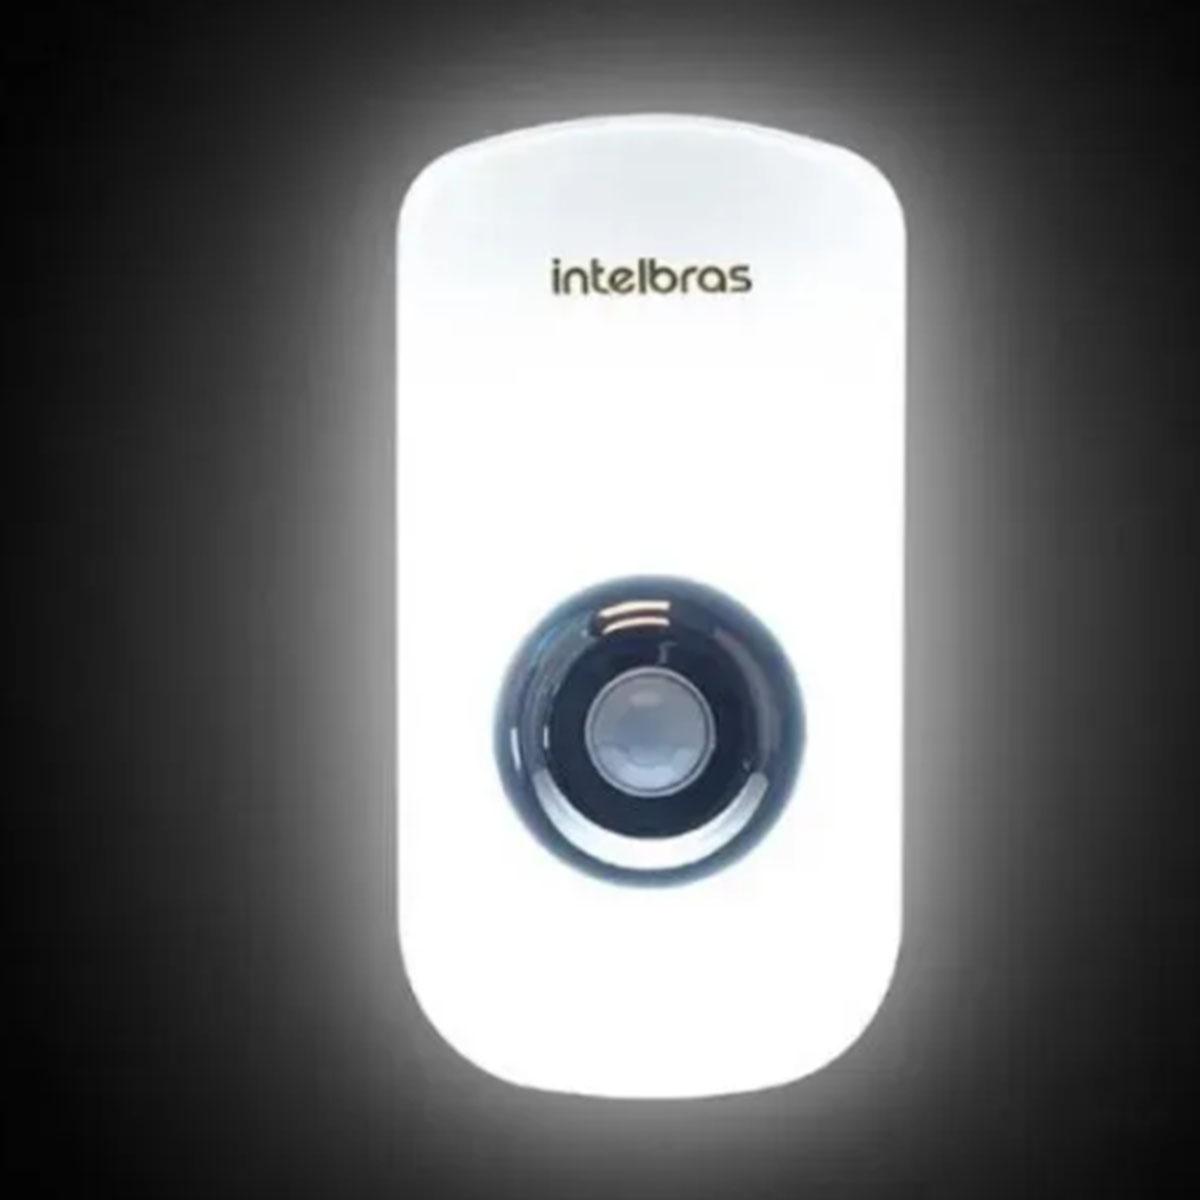 Kit 4 Luminária Intelbras Led c/ Sensor De Presença Esi 5002